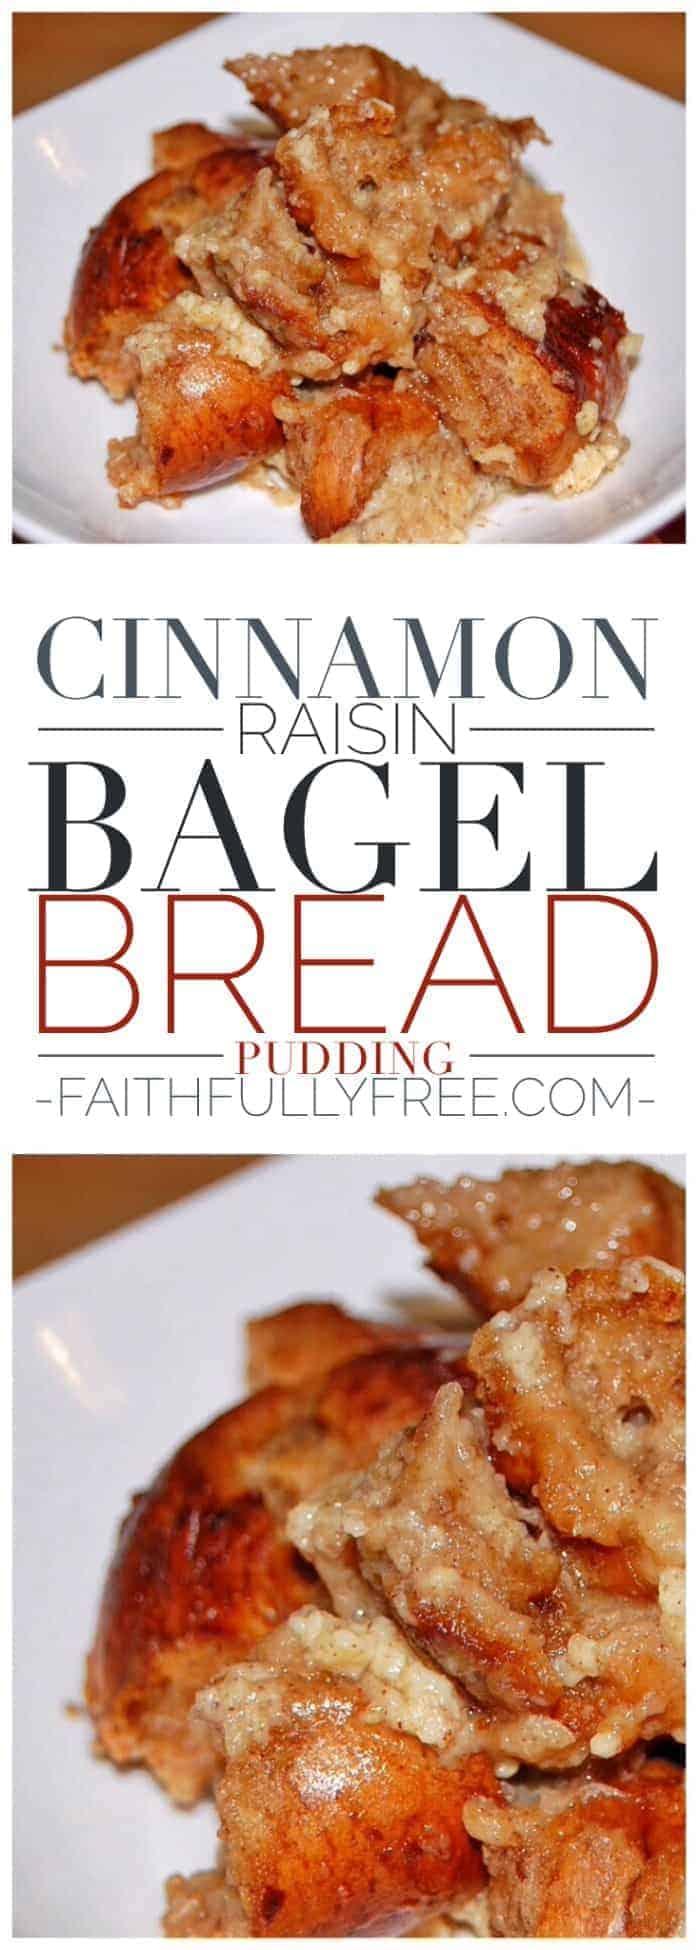 Cinnamon Raisin Bagel Bread Pudding Recipe | Faithfully Free